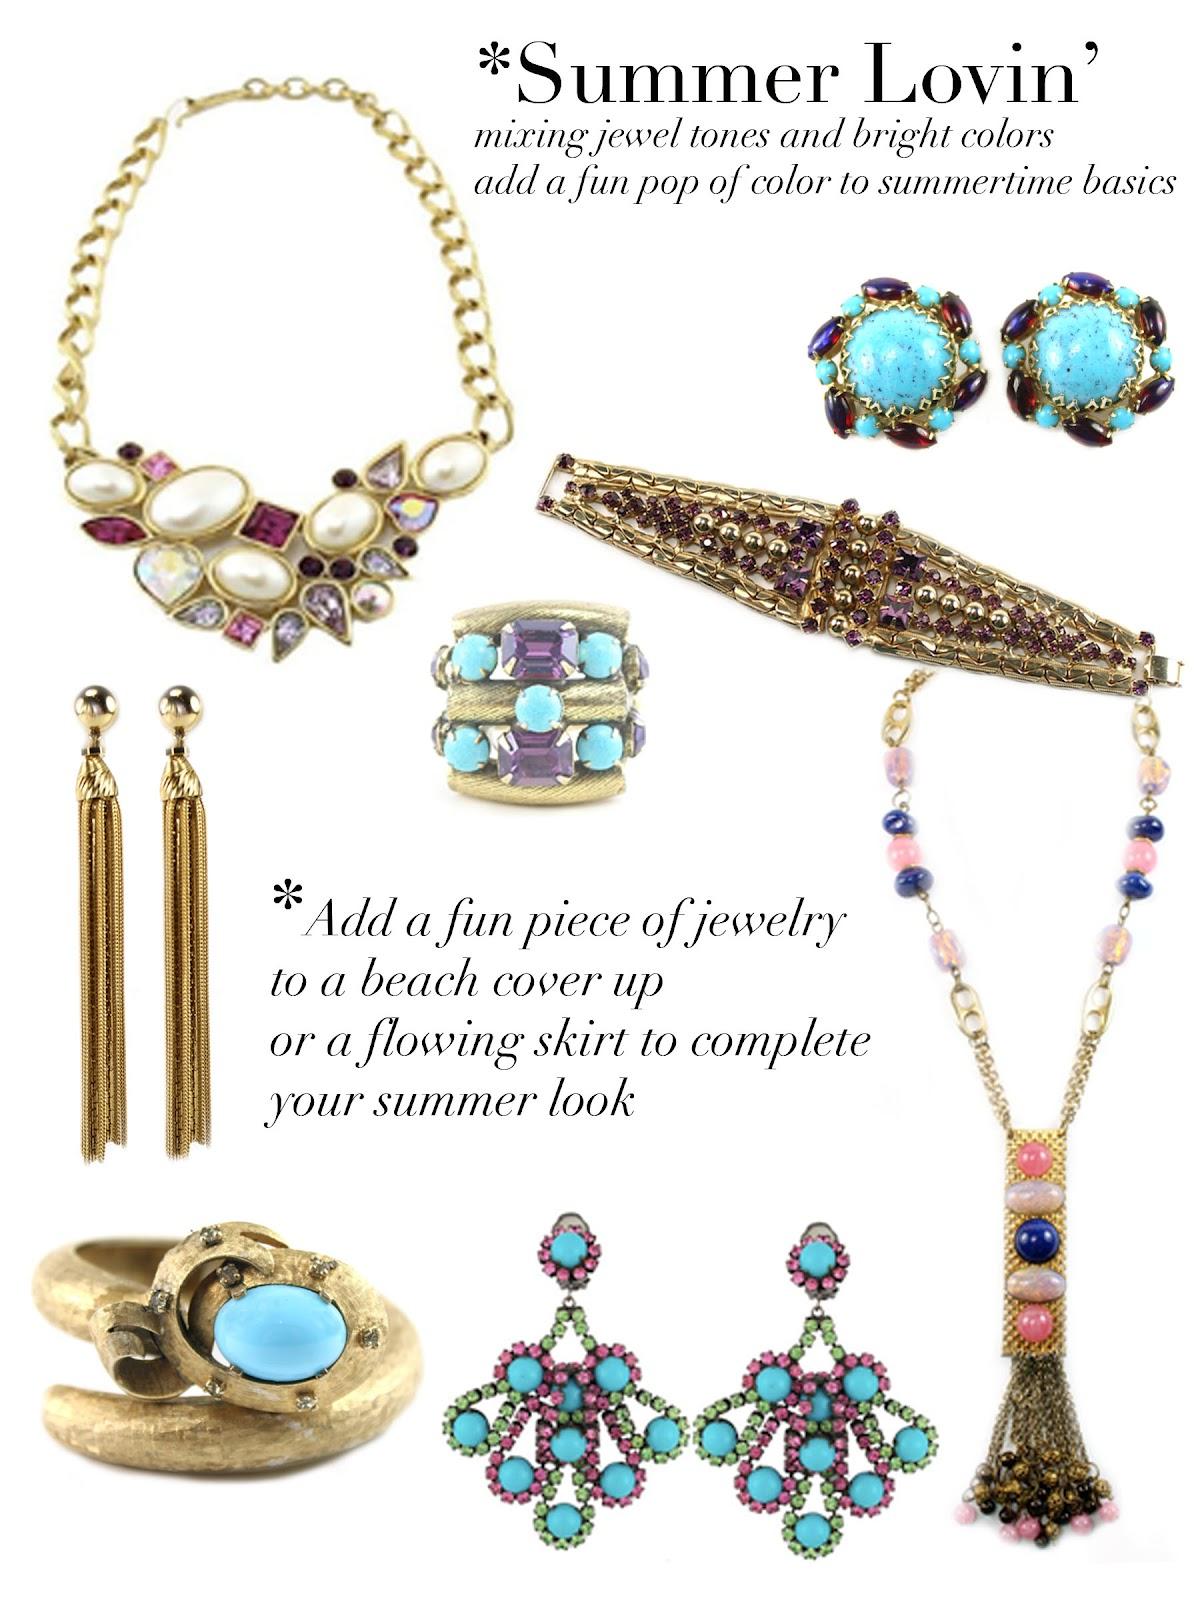 House Of Lavande Blog: Jewelry Trend: Summer Lovin'